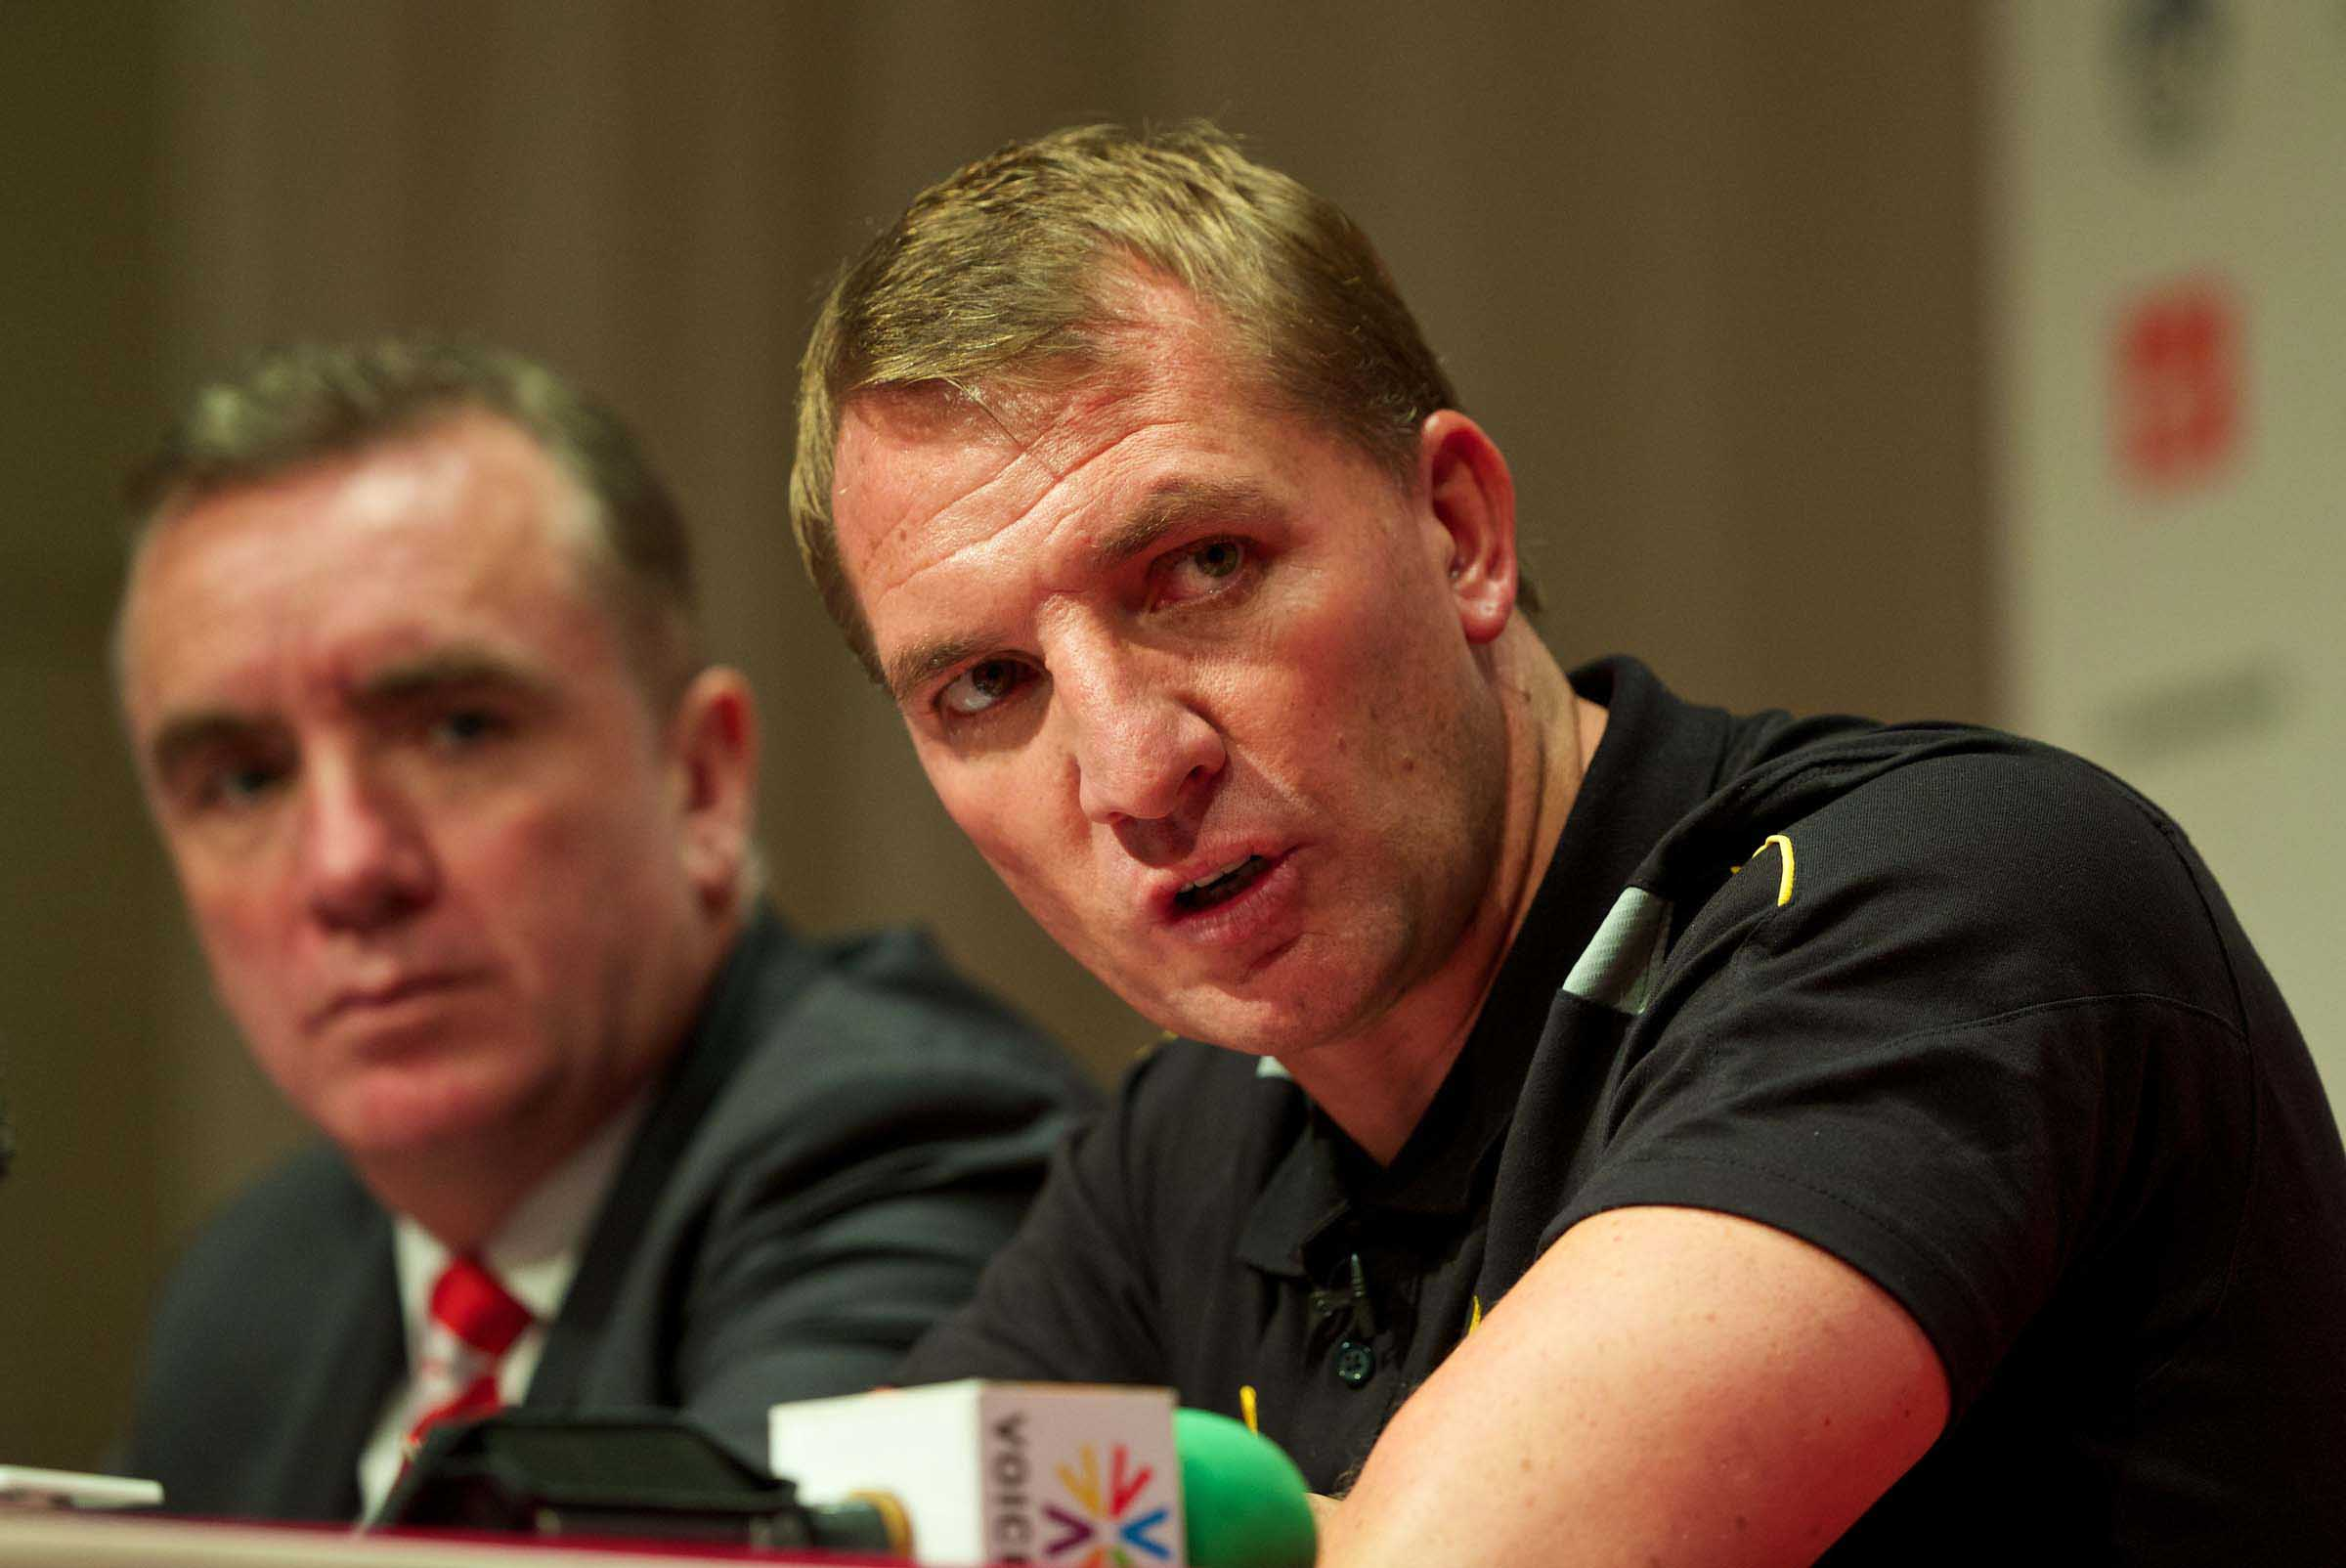 Football - Liverpool FC Preseason Tour 2013 - Liverpool Press Conference